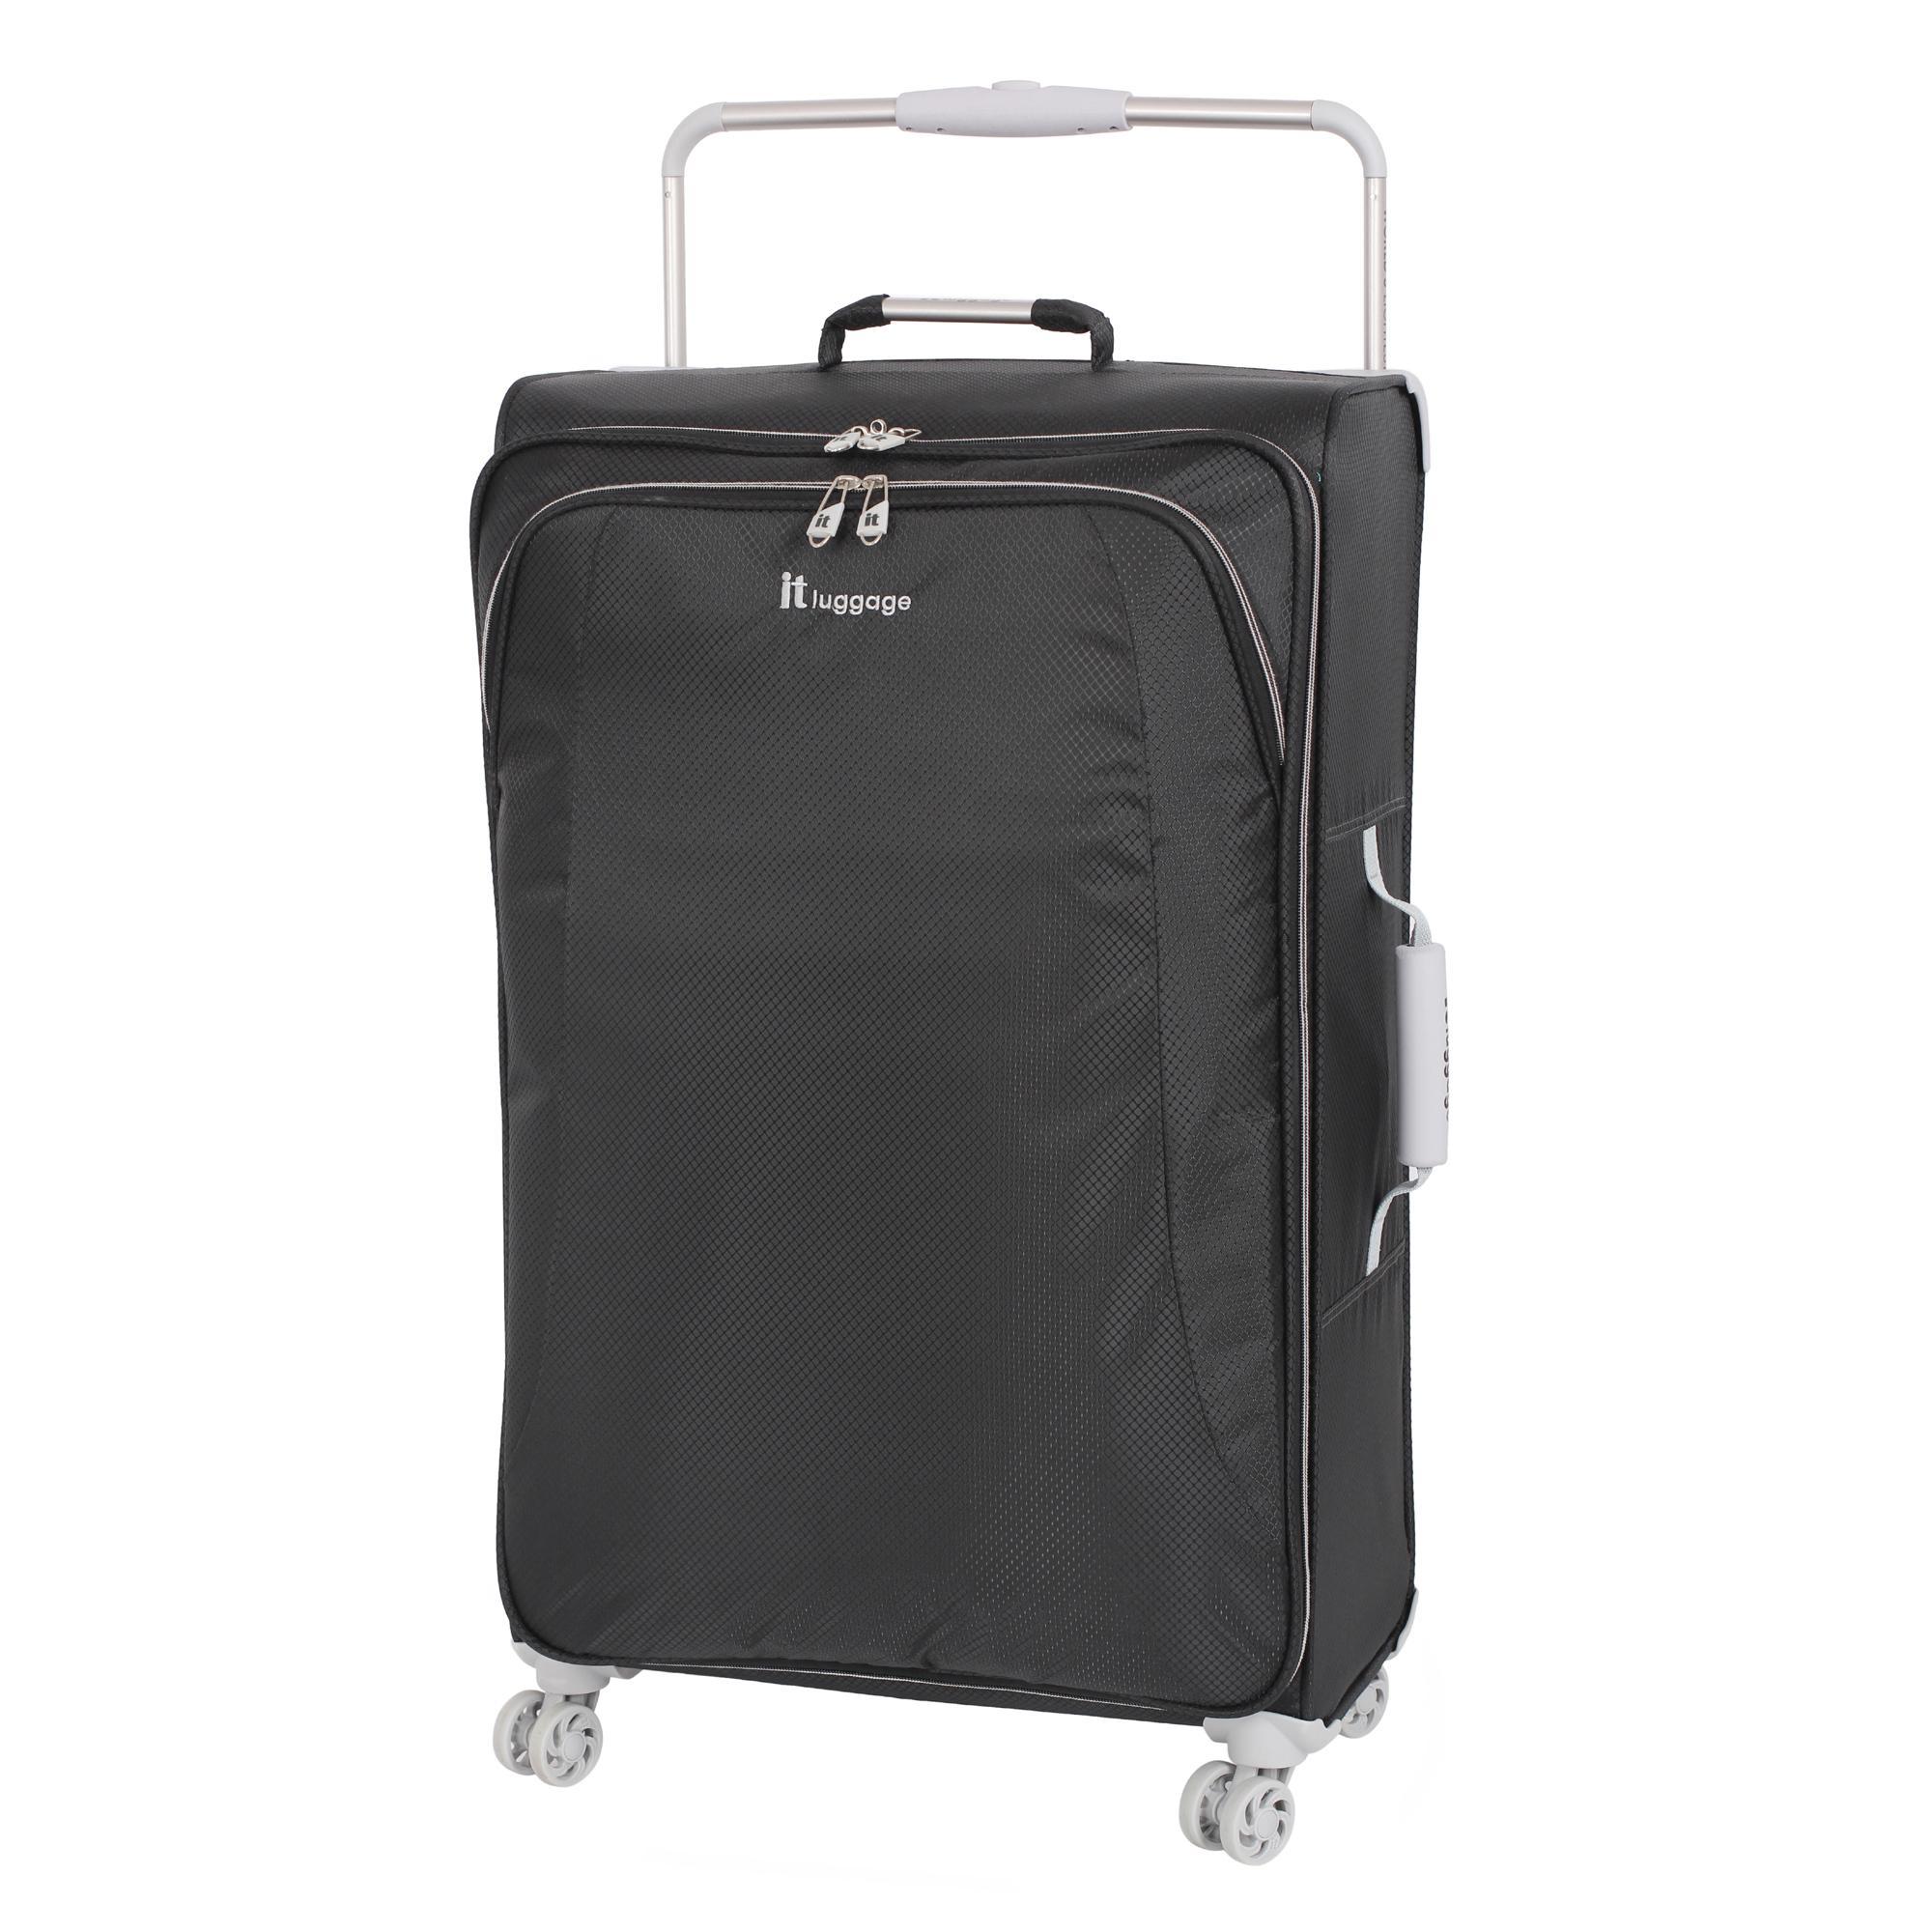 it luggage world 39 s lightest 31 5 8 wheel. Black Bedroom Furniture Sets. Home Design Ideas